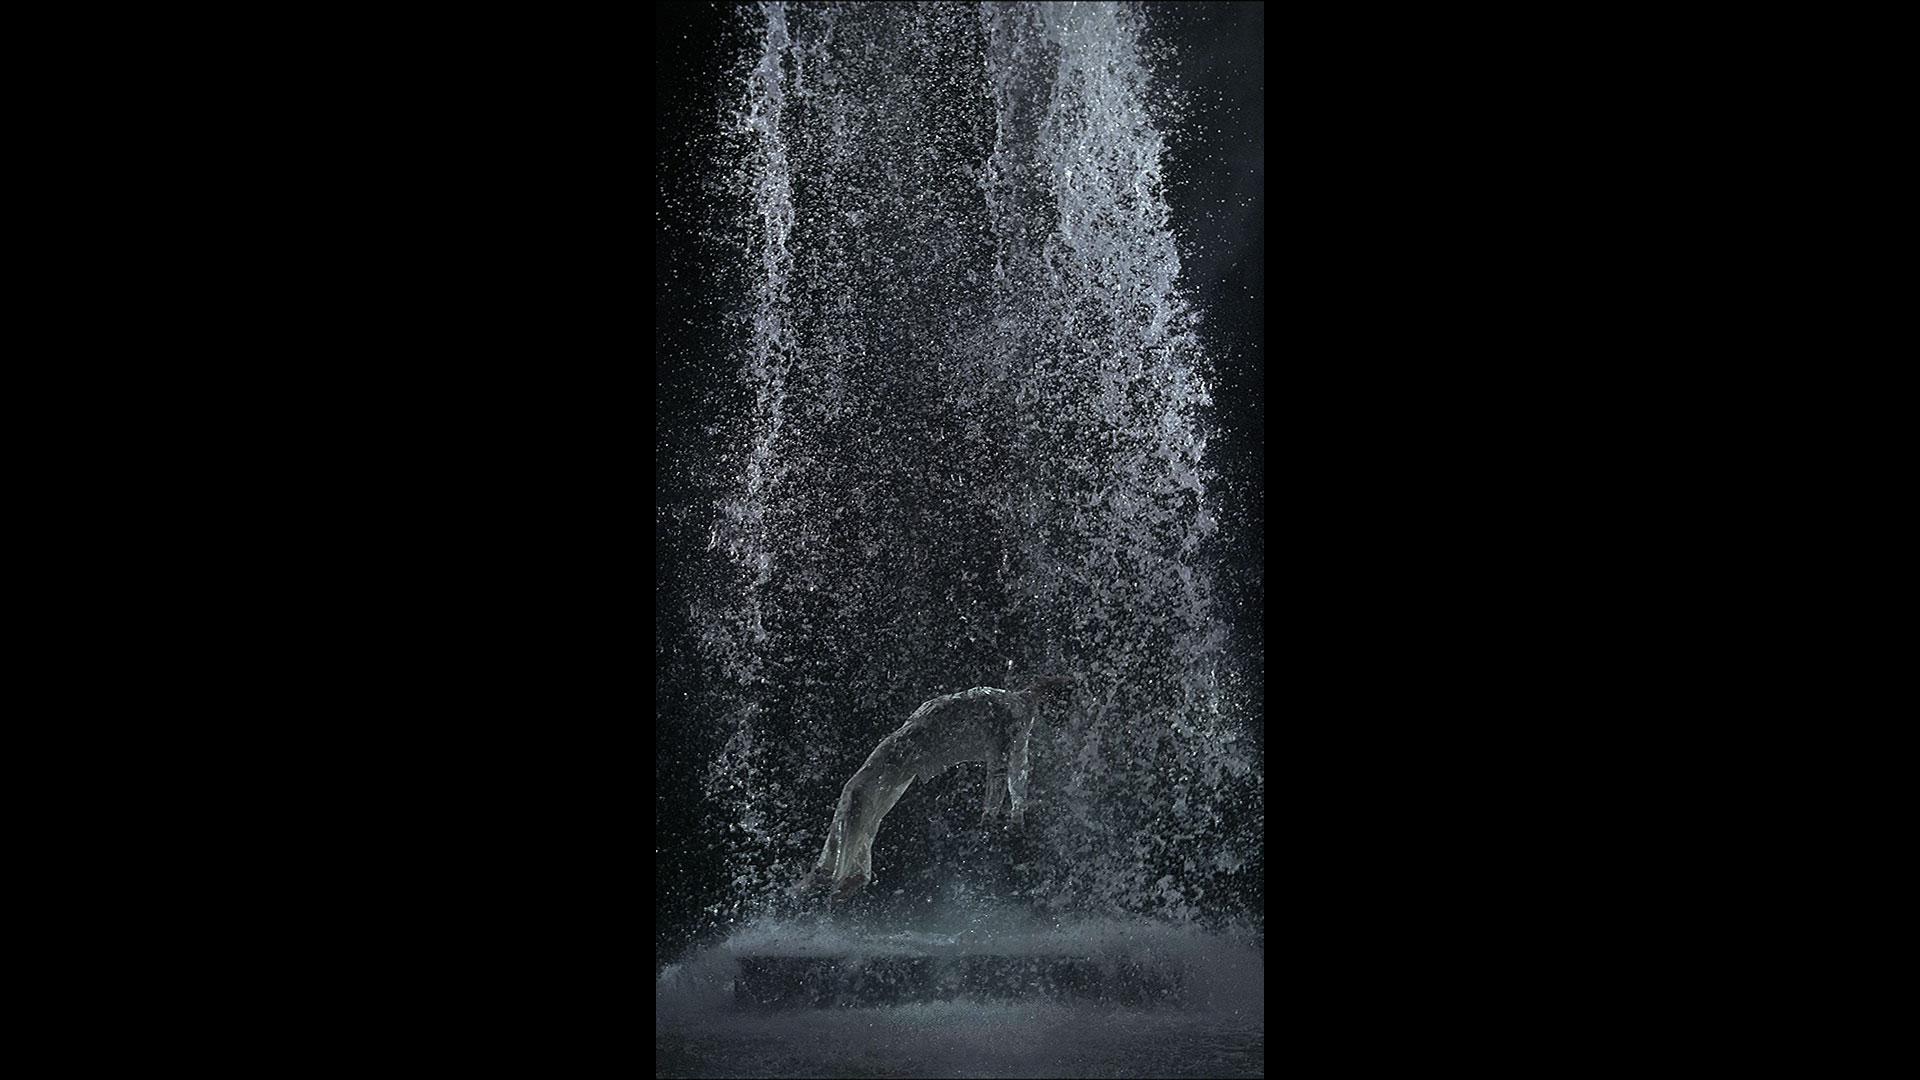 Bill Viola, Tristan's Ascension (The Sound of a Mountain Under a Waterfall) (2005). Video/sound installation. Performer: John Hay. Courtesy Bill Viola Studio. Photo: Kira Perov.